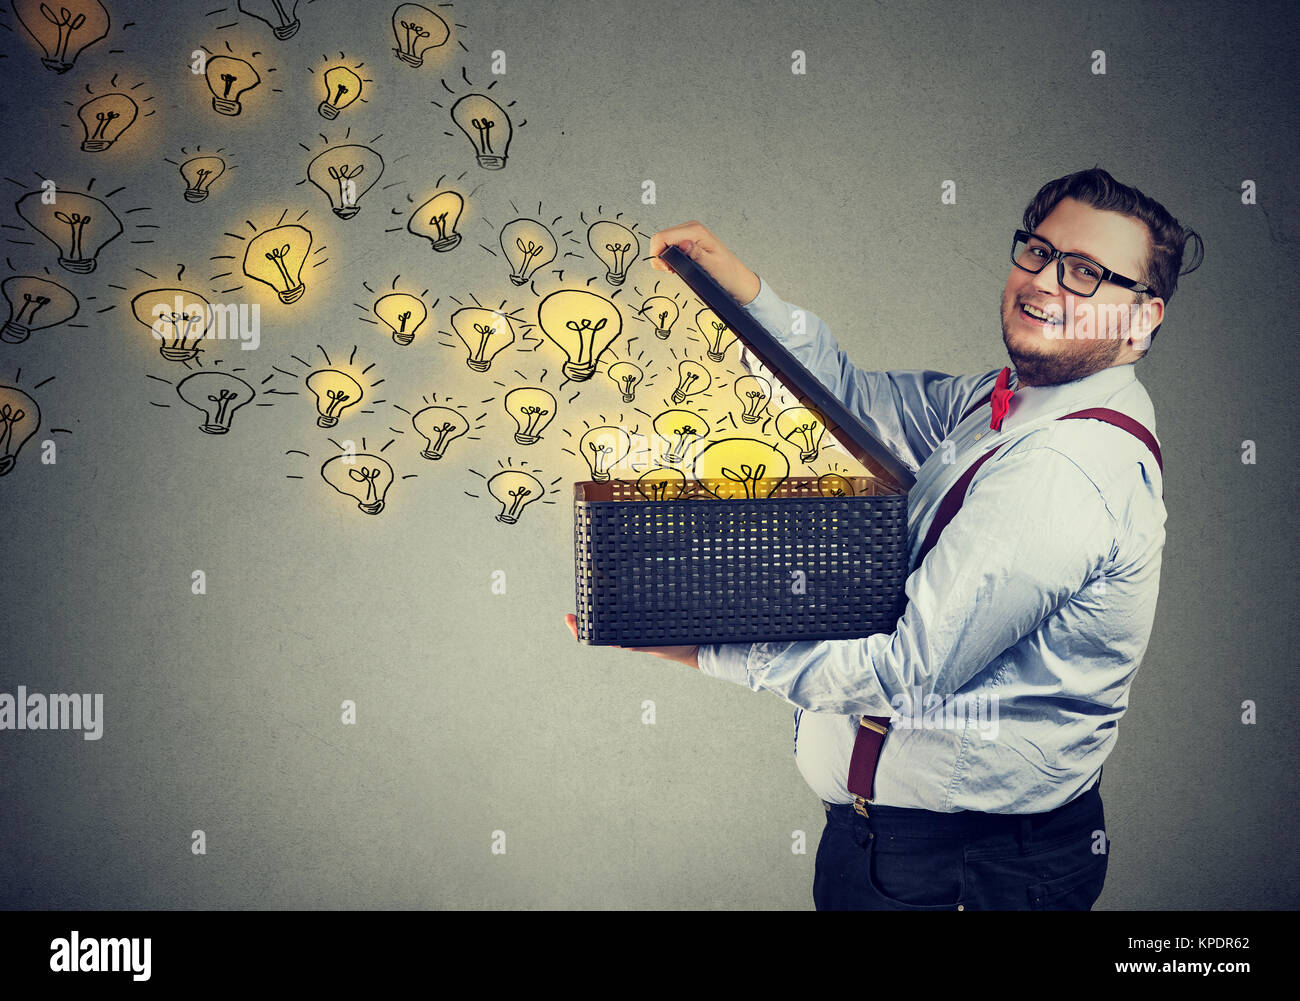 Vue de côté de chunky man holding box avec des idées brillantes bein creative and smiling at camera. Photo Stock